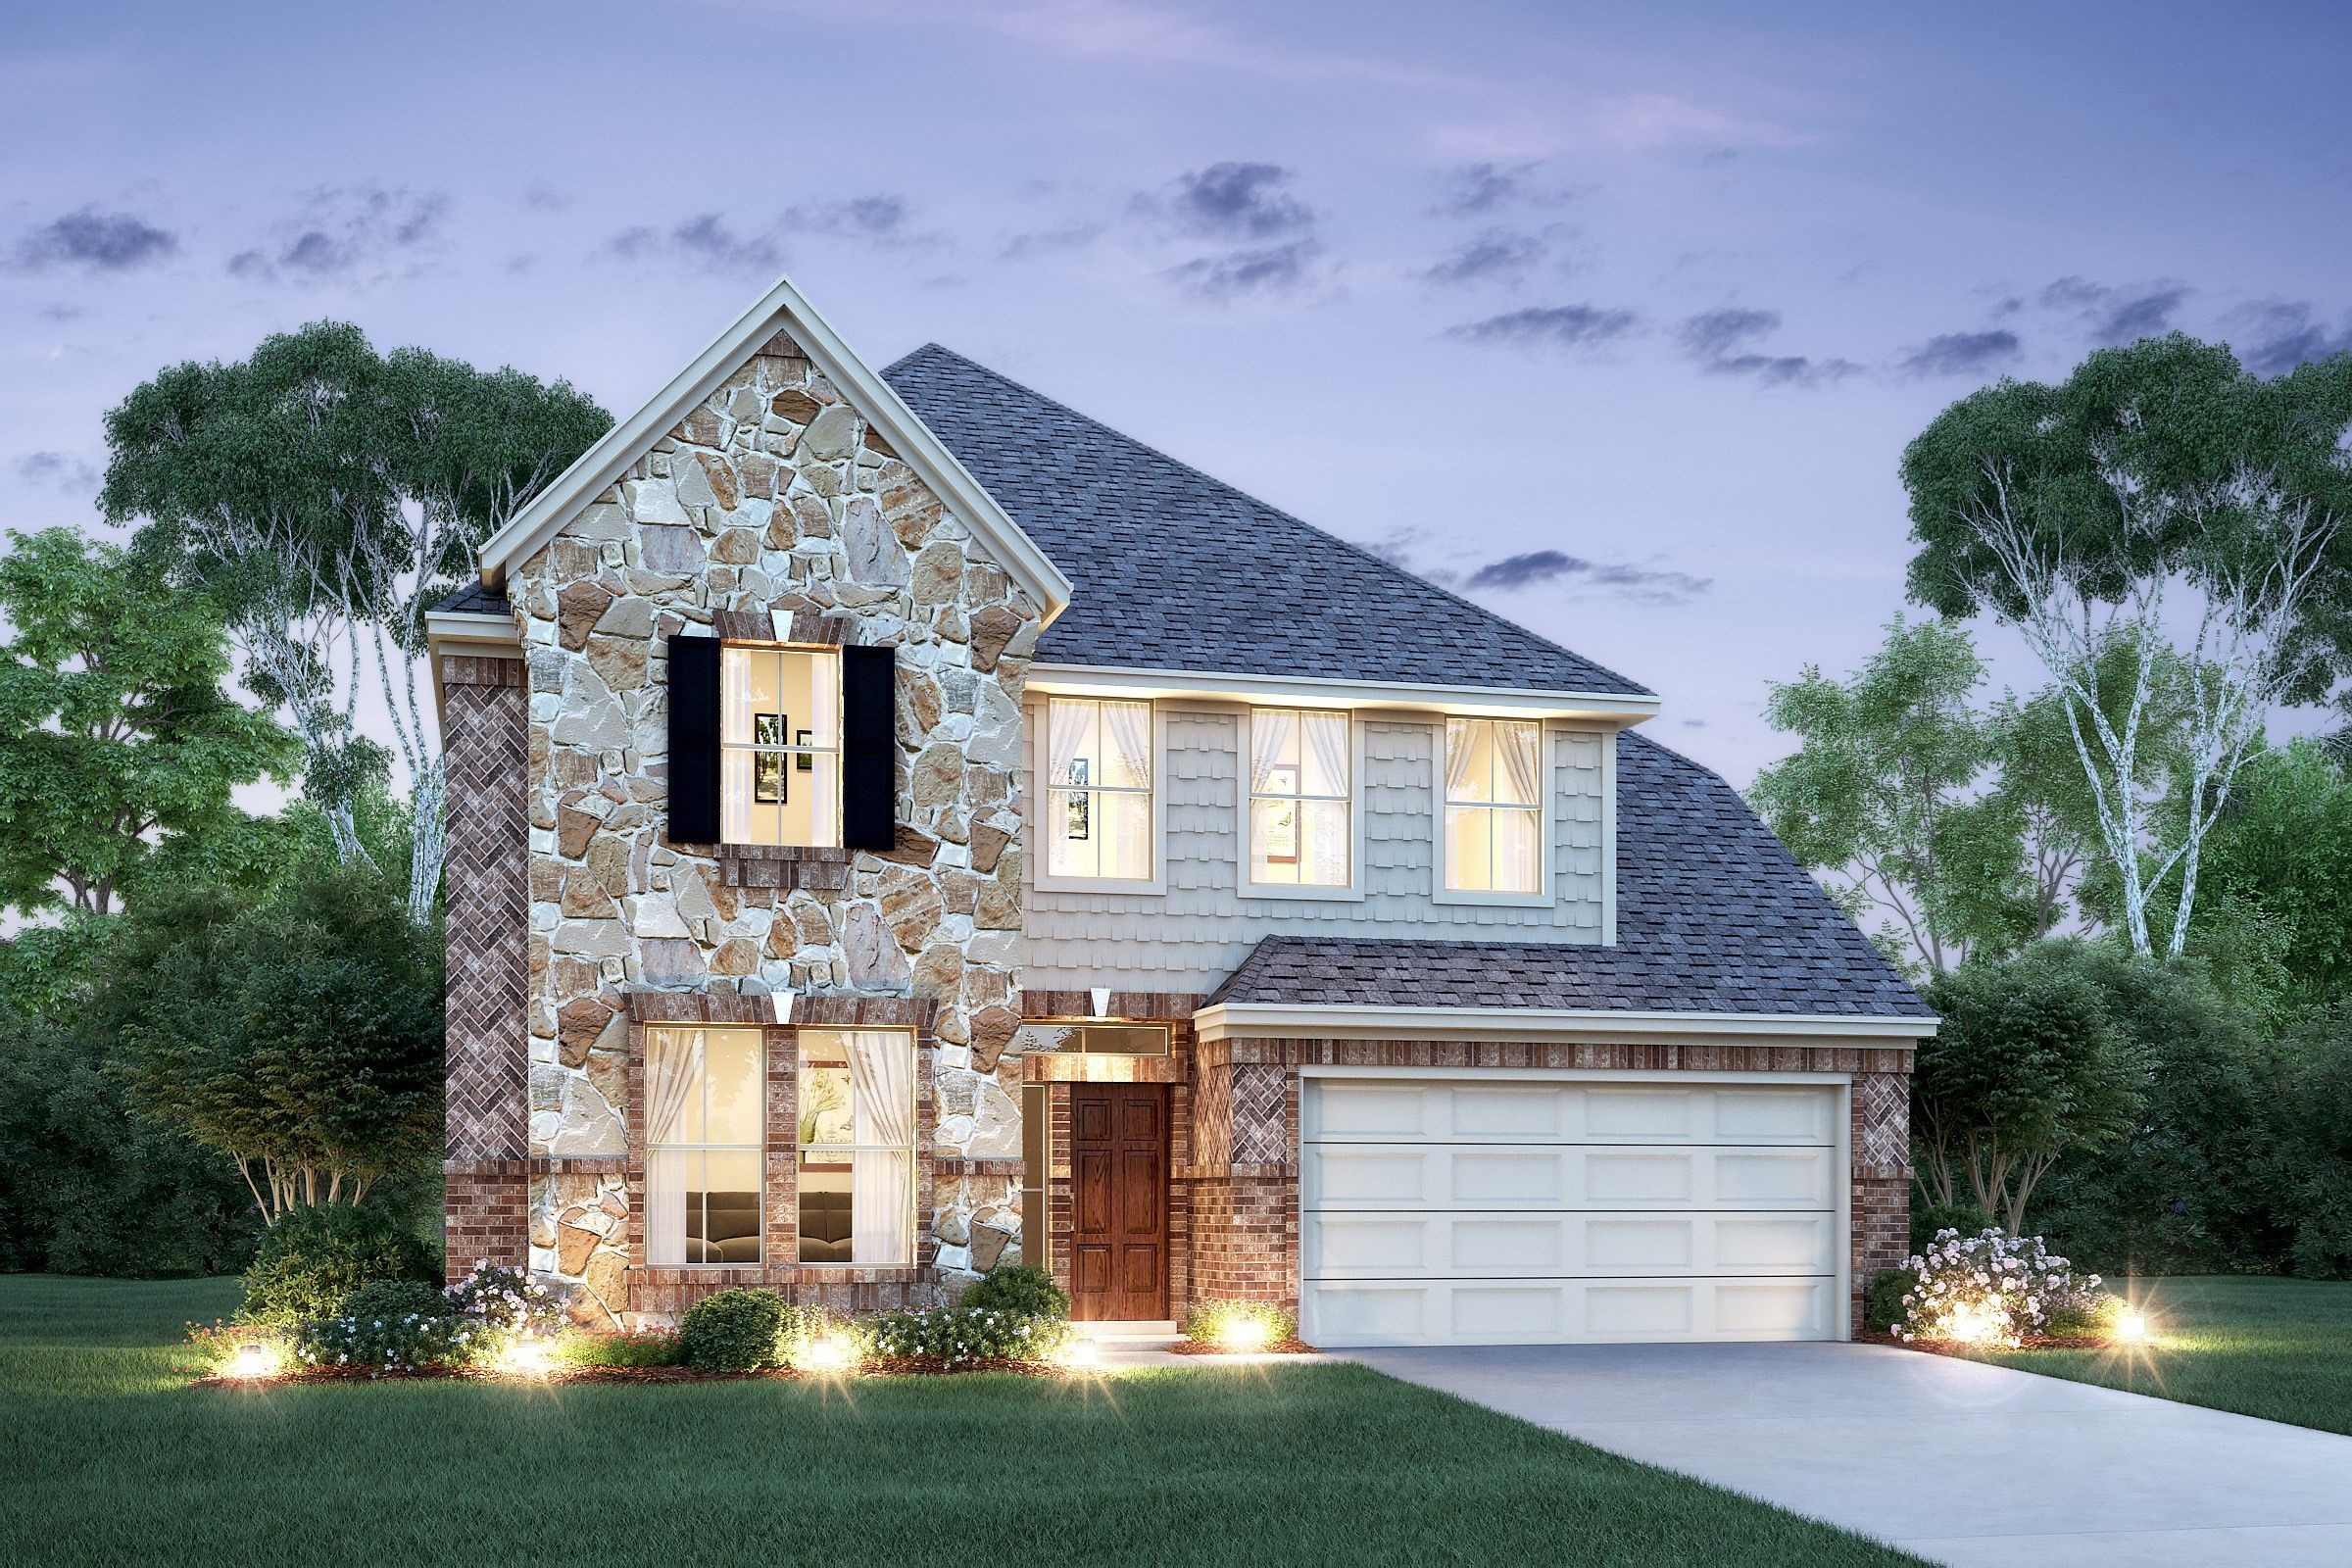 Single Family for Sale at Bayou Lakes - Leo 1804 Cranston Grove Drive Dickinson, Texas 77539 United States